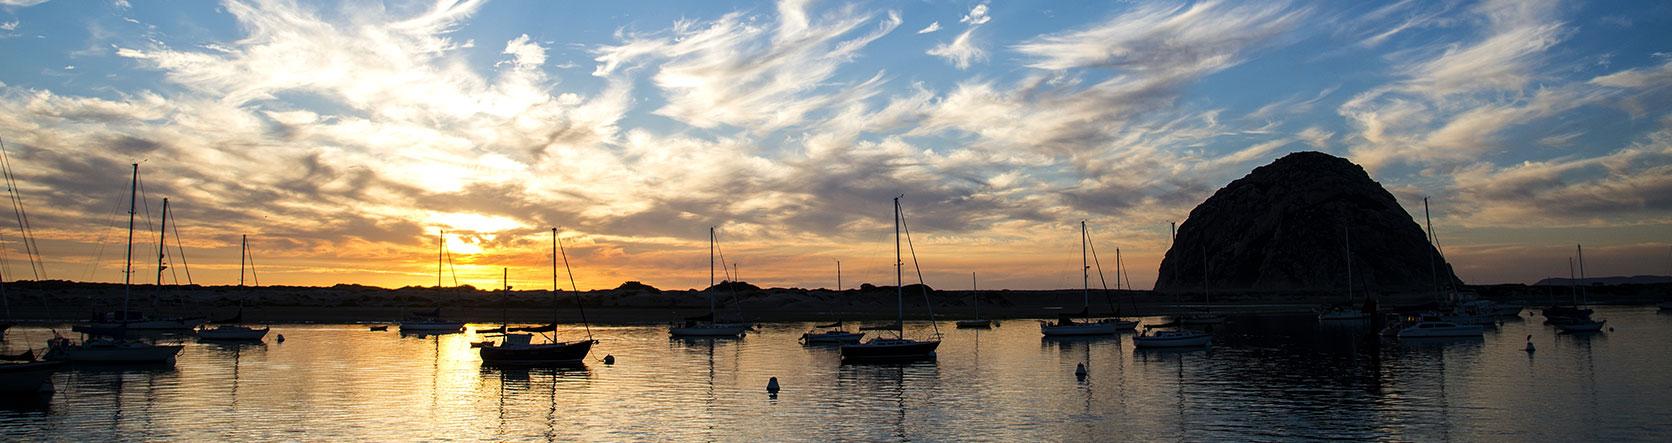 Beach-N-Bay-Getaways-Morro-Bay-California-Vacation-Rentals